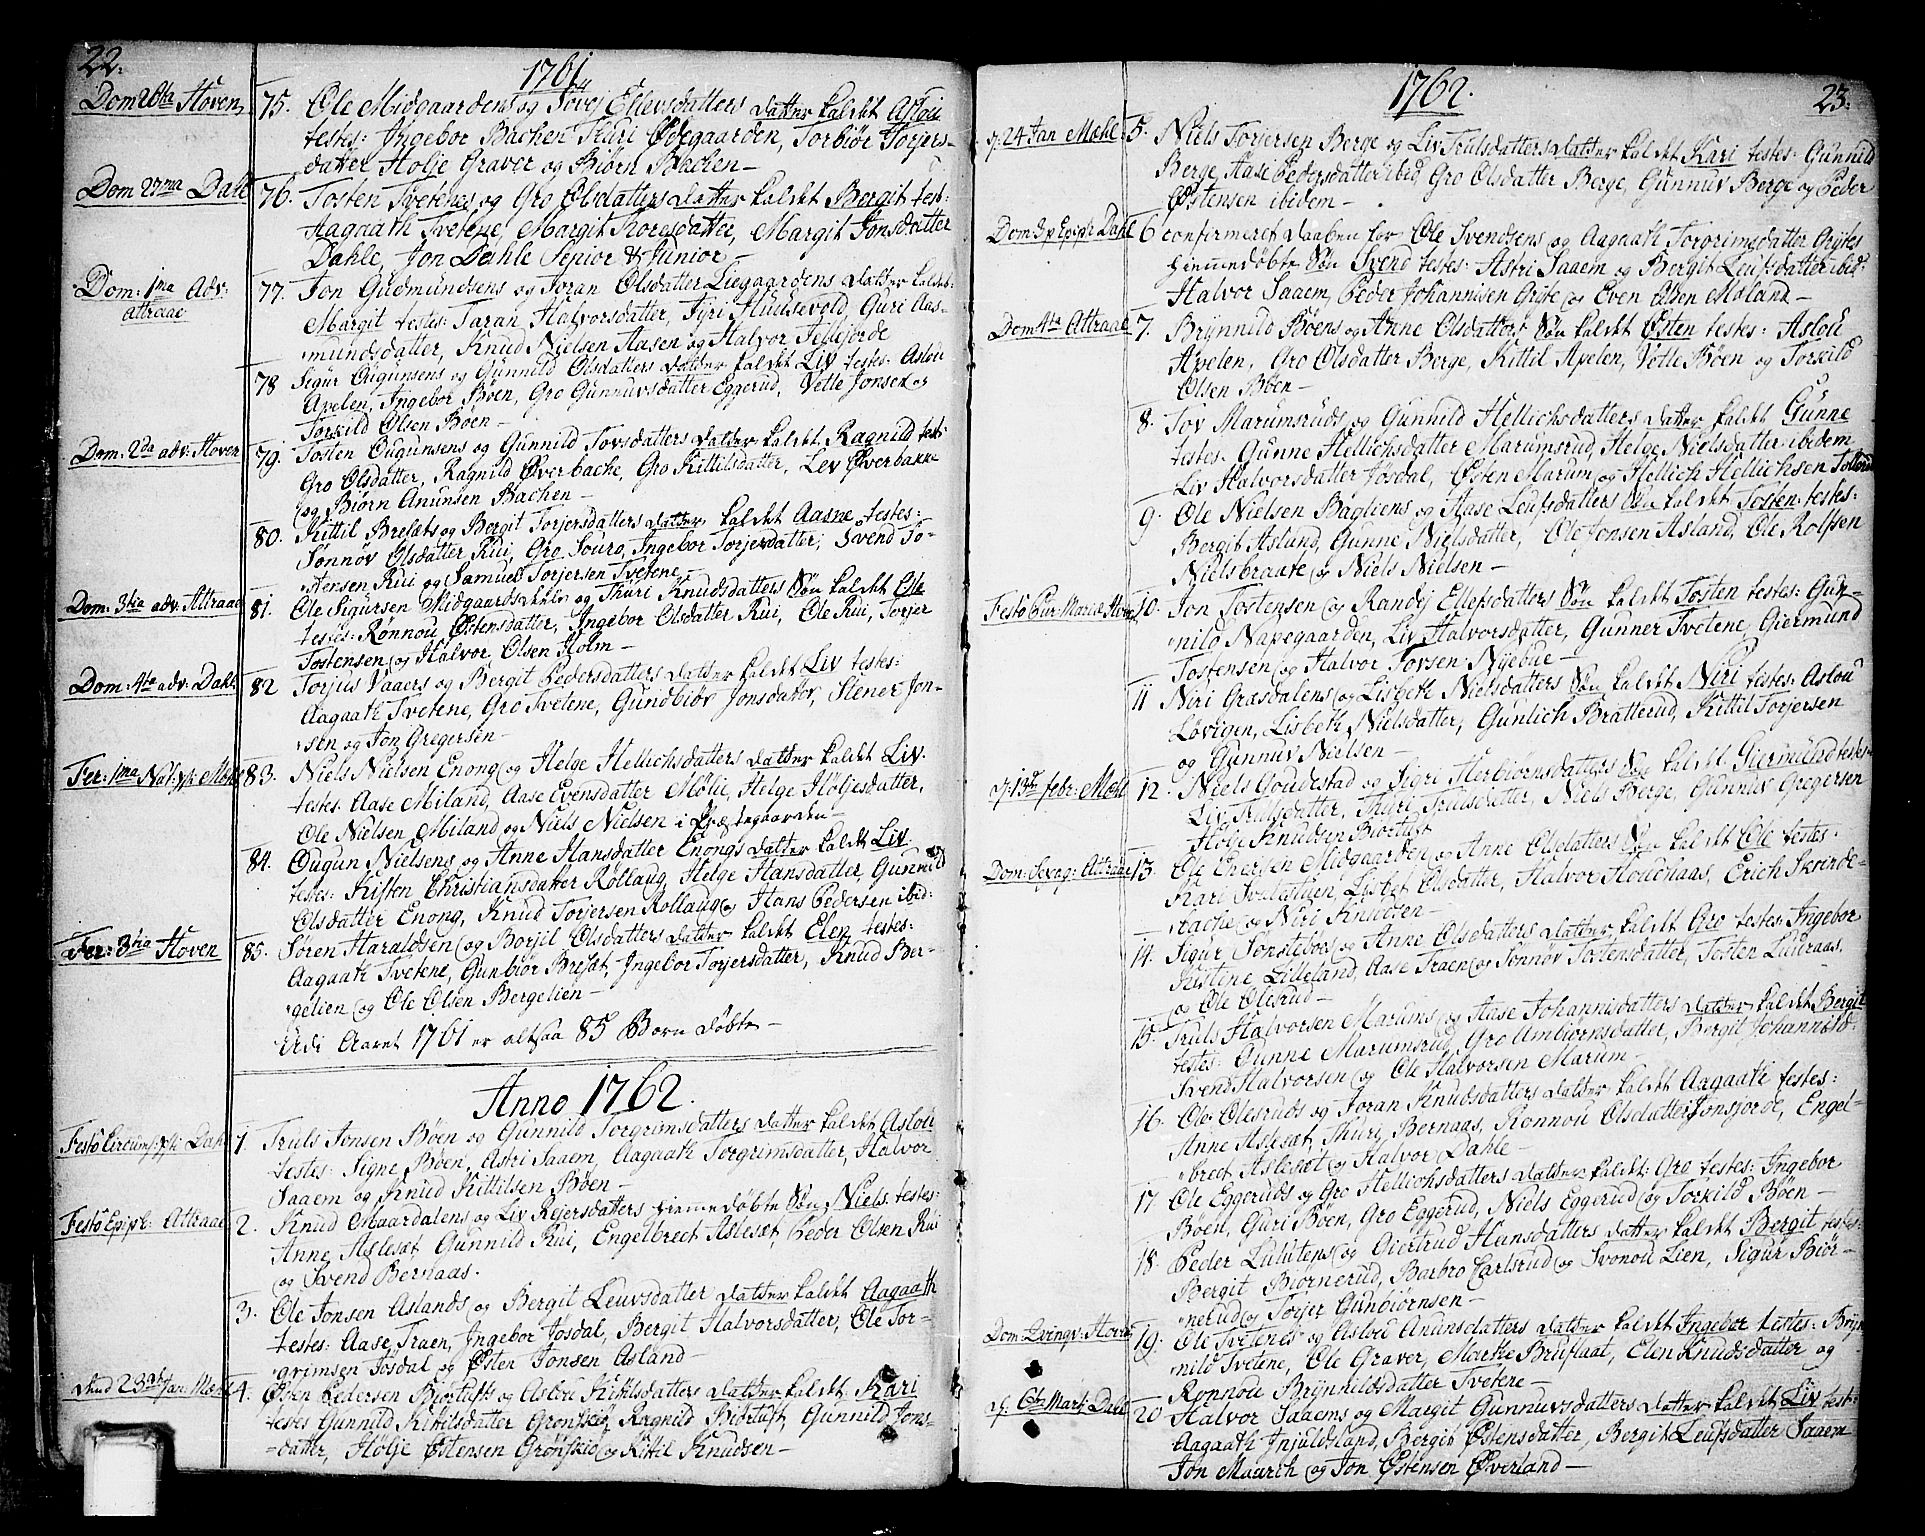 SAKO, Tinn kirkebøker, F/Fa/L0002: Ministerialbok nr. I 2, 1757-1810, s. 22-23